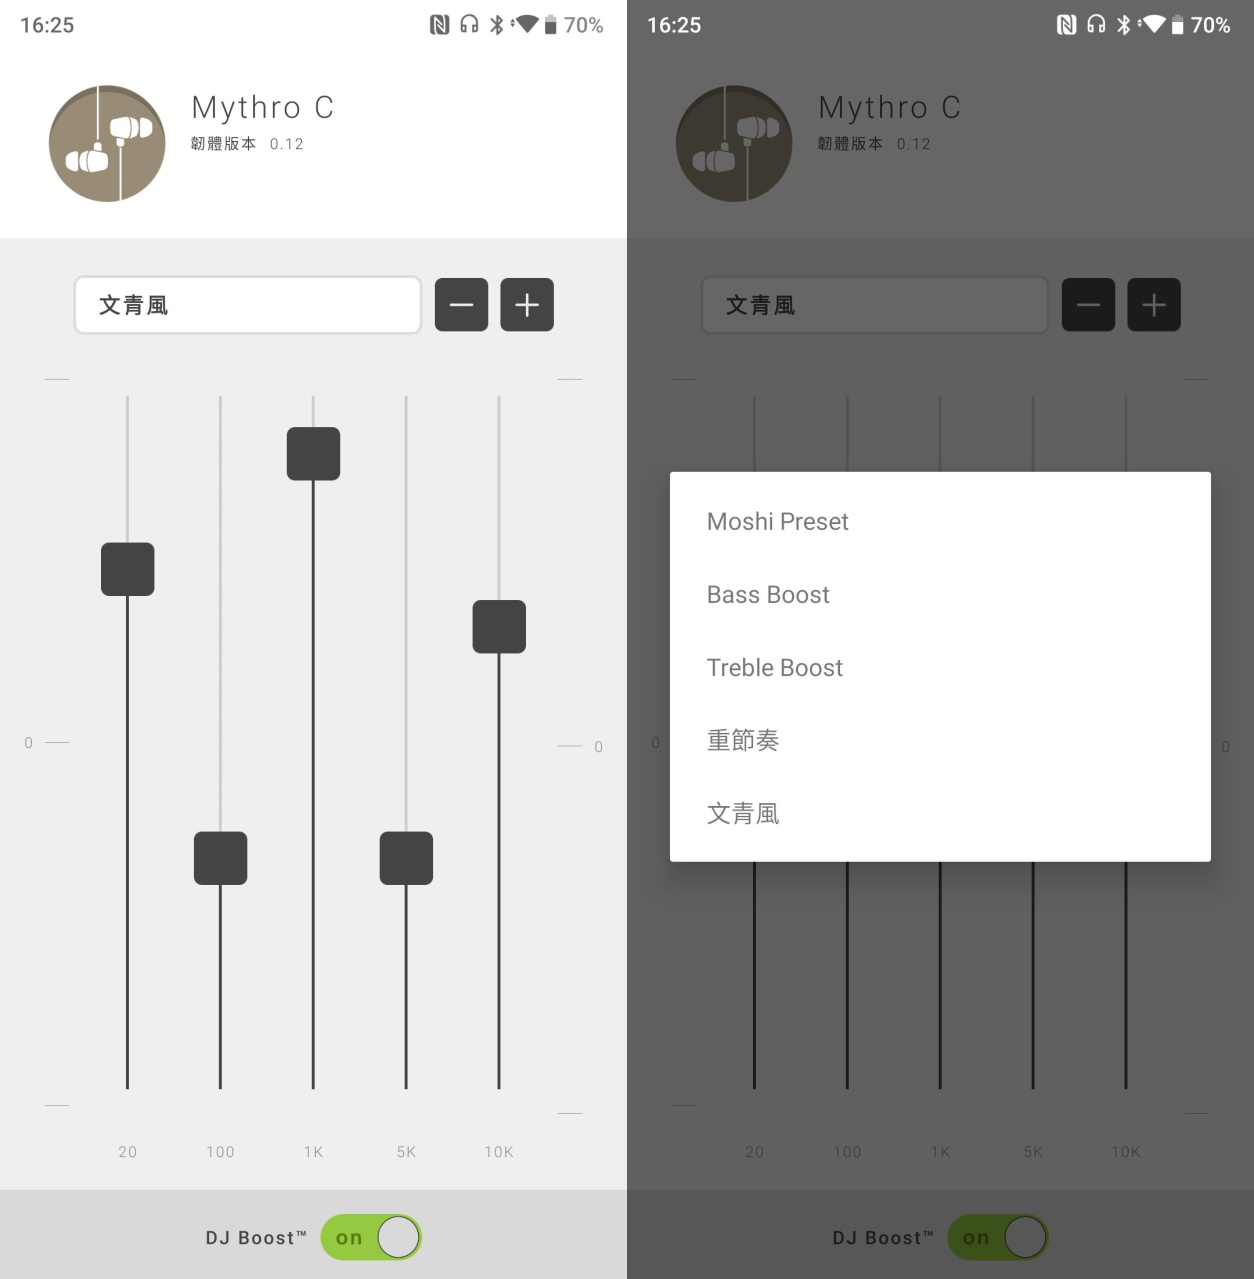 「Moshi Digital Audio 」App 最多可以儲� 5 組�定值,讓音樂隨著消費者的喜好、心情或口味來呈現。更棒的是軟體會自動更新,無時無刻都提供耳機最佳的相容性。